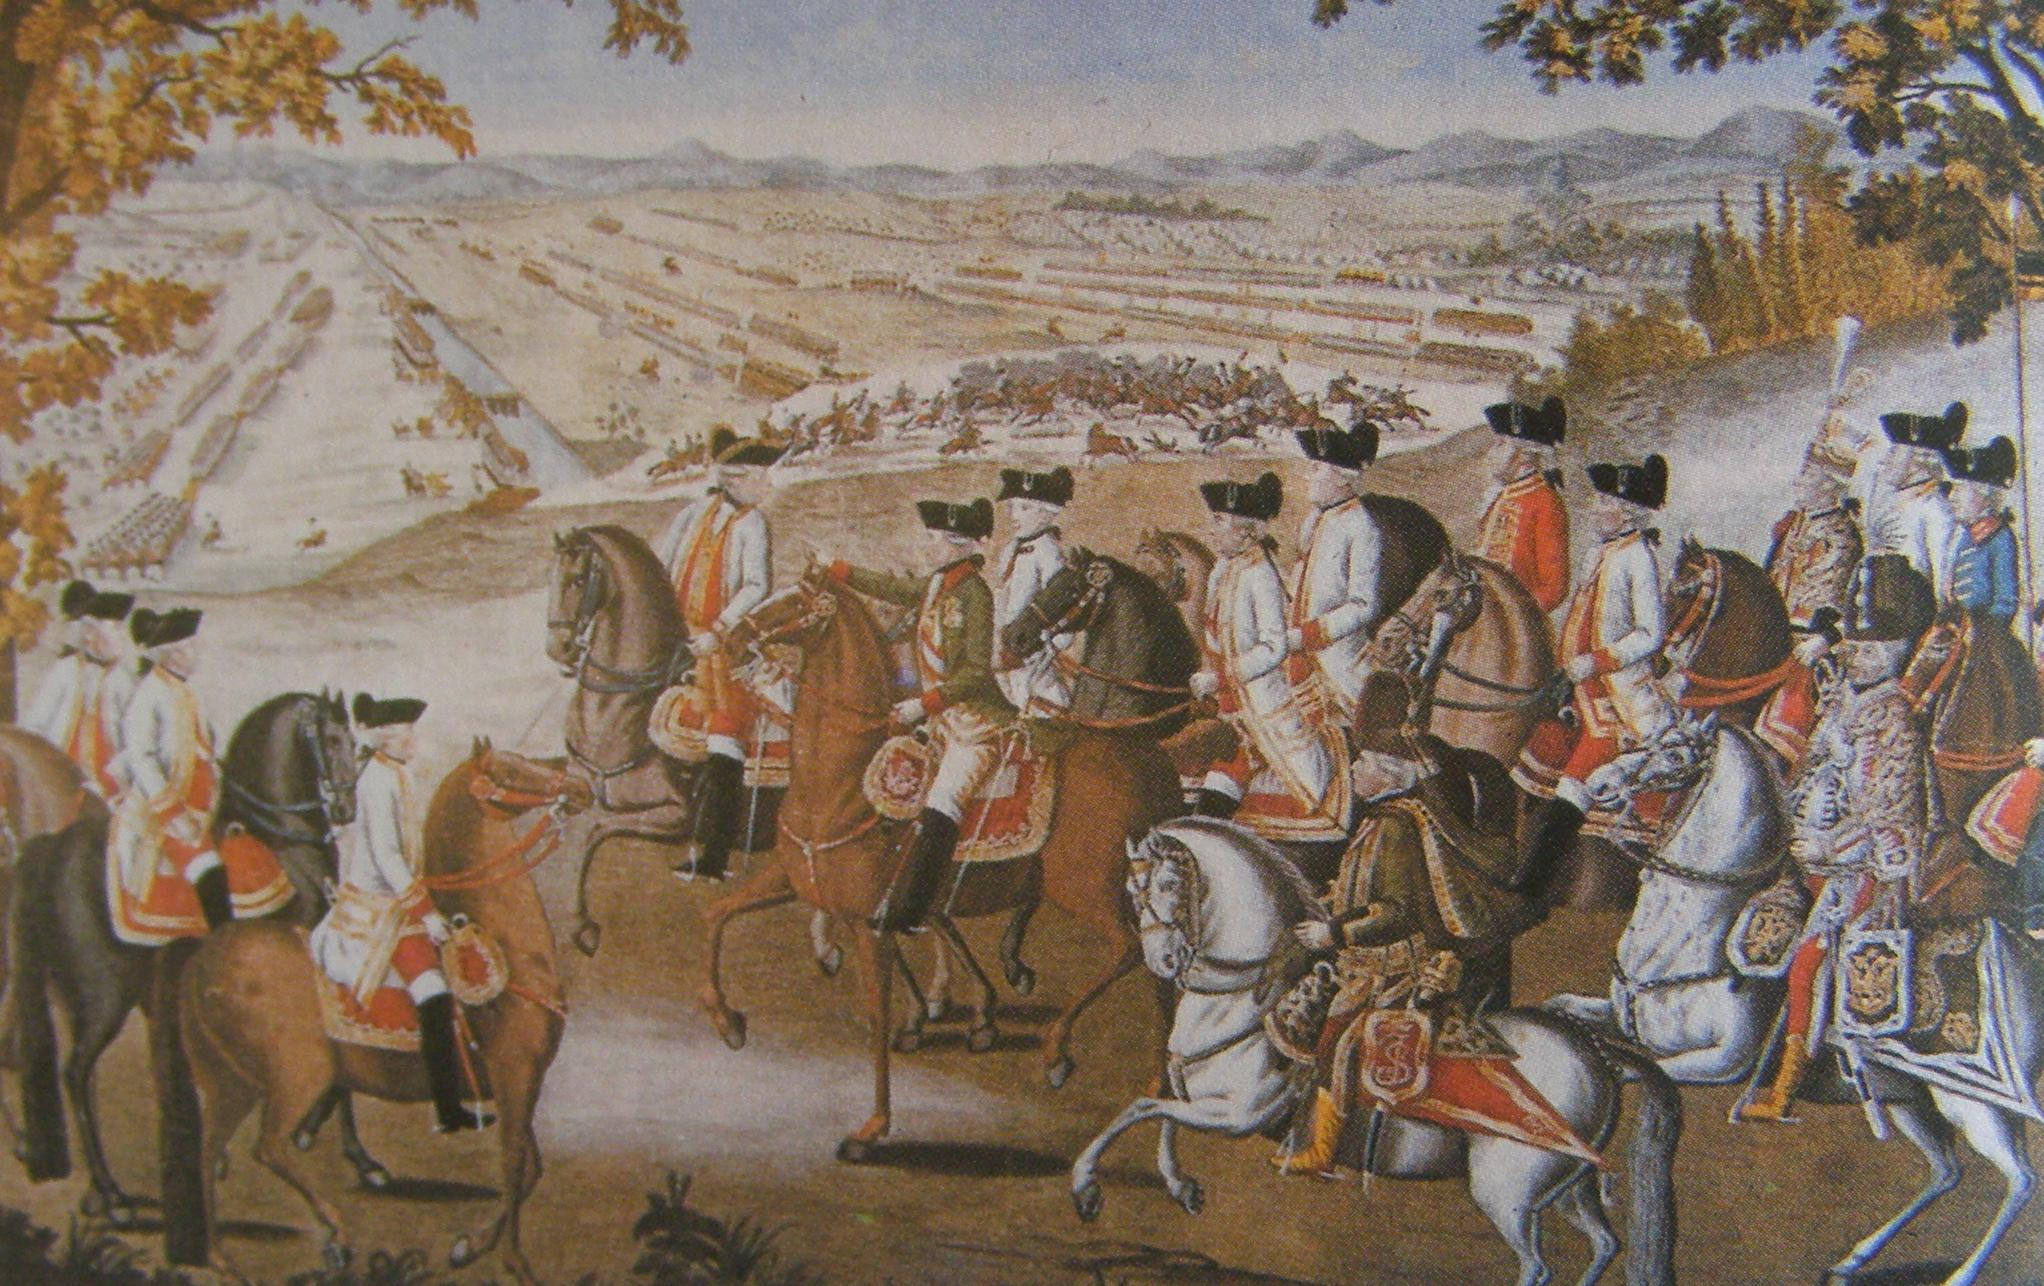 Joseph II, Emperor of Austria and his soldiers.